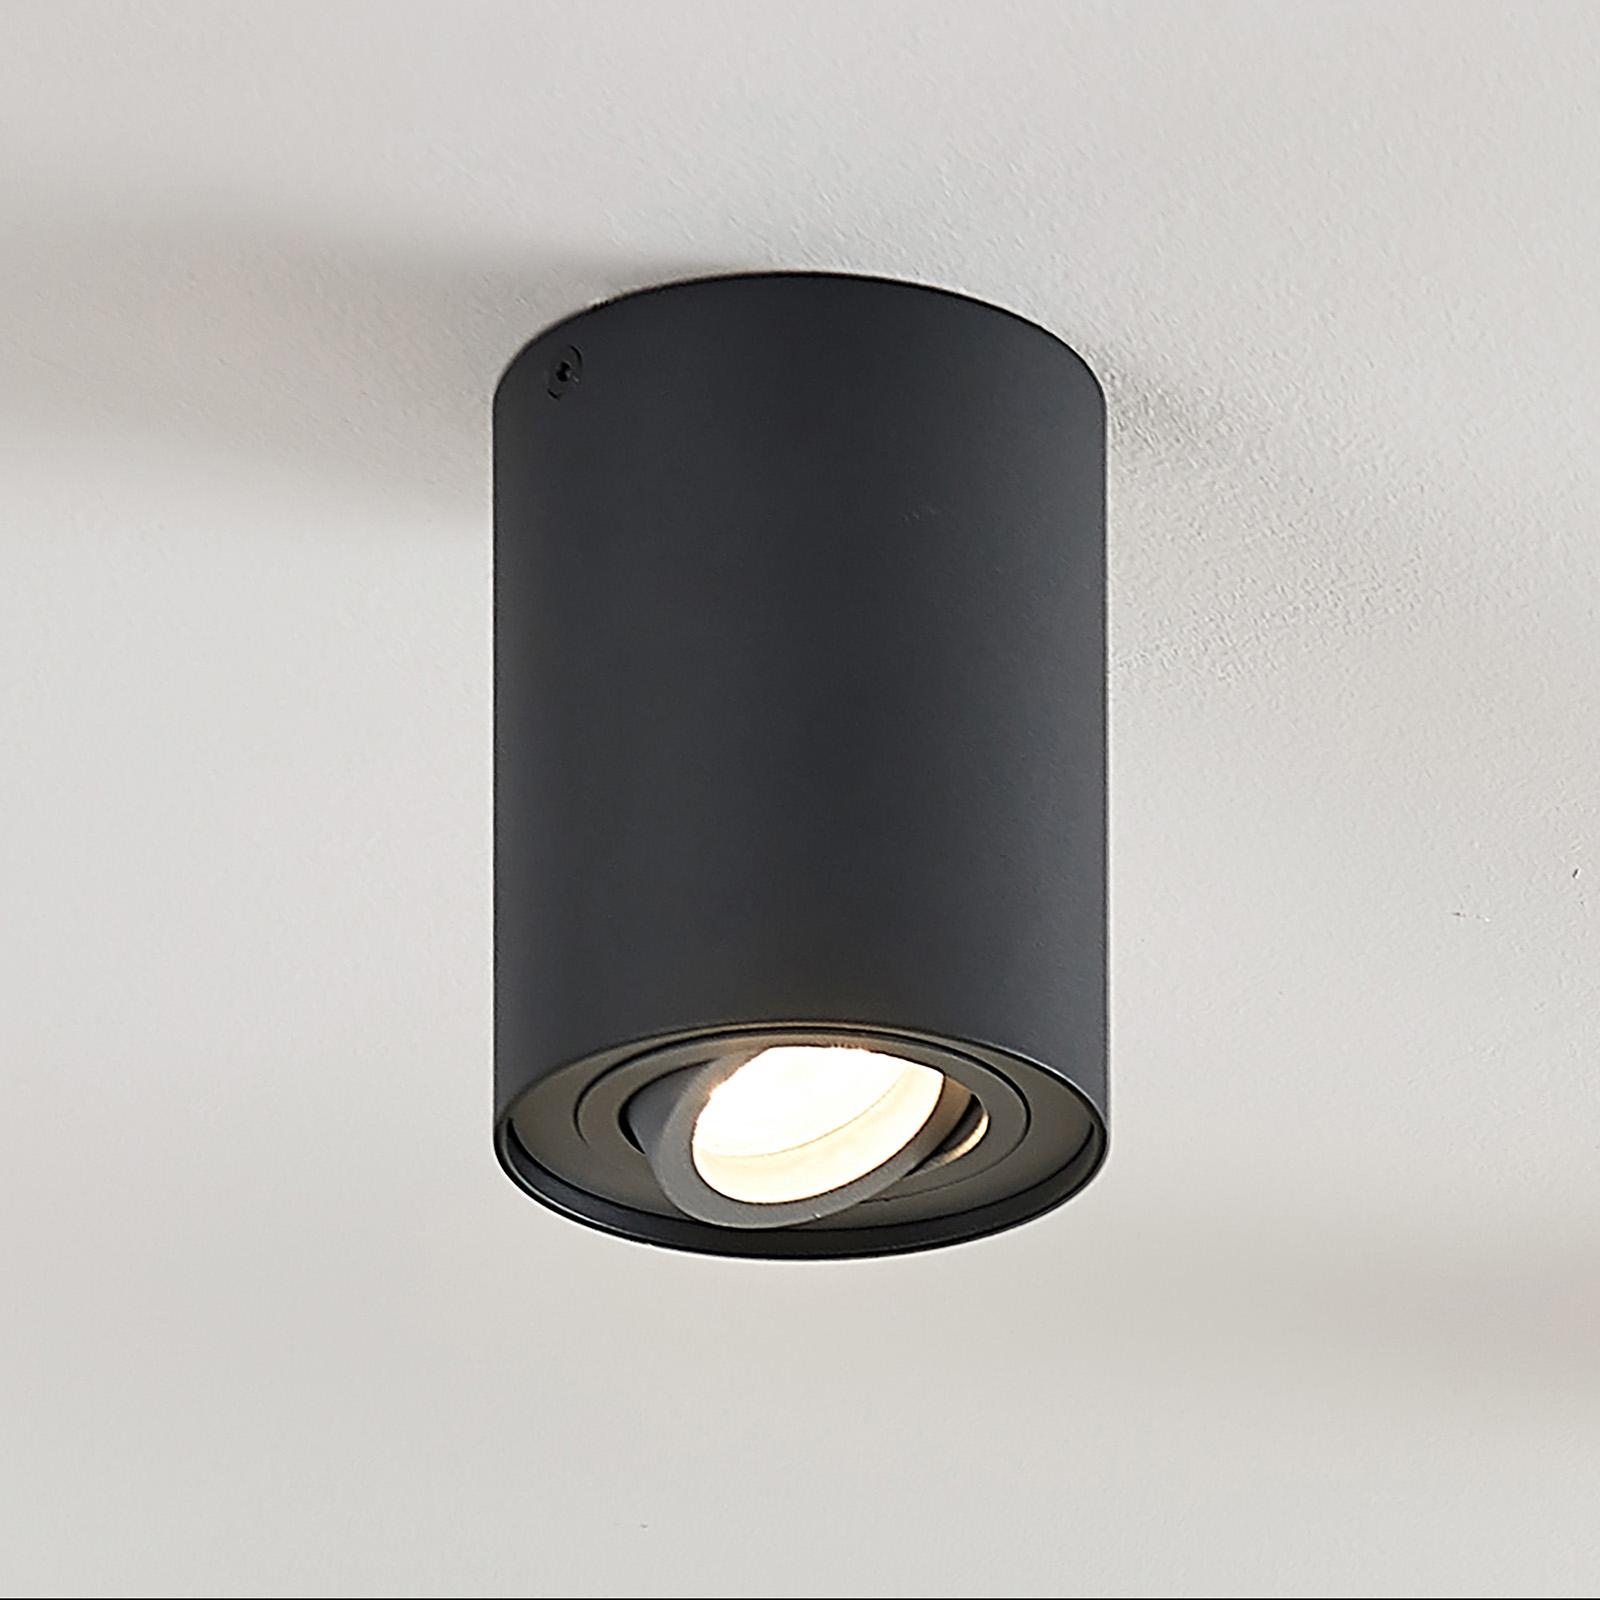 ELC Jeyla påbyggnads-downlight, GU10, antracit